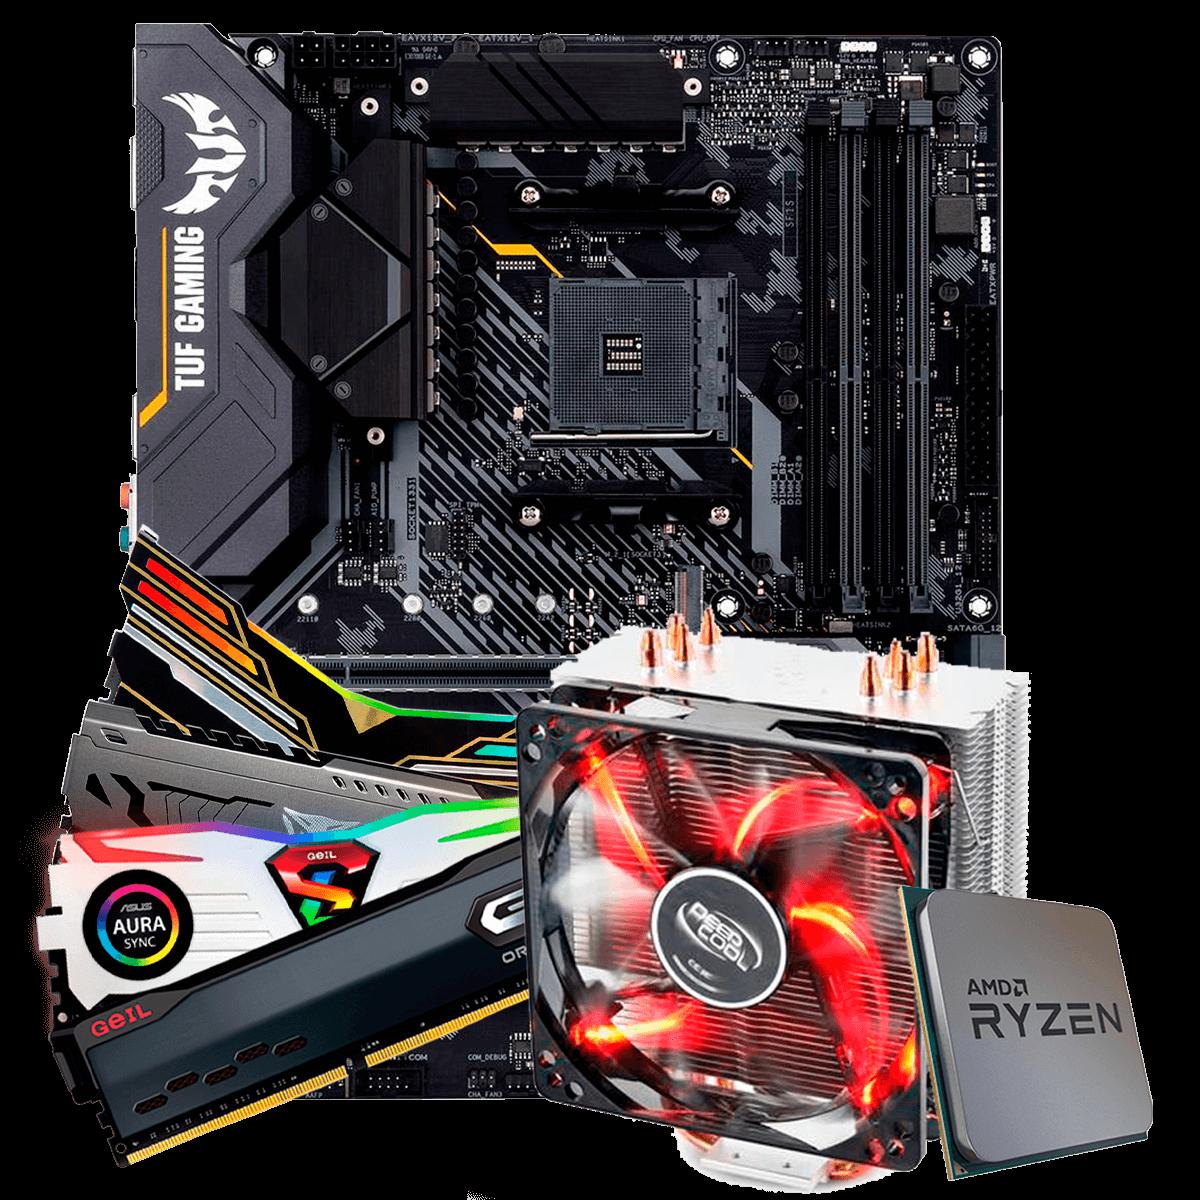 Kit Upgrade, AMD Ryzen 9 3900X, Asus TUF Gaming X570-Plus, Memória DDR4 16GB 3000MHz, Cooler Deepcool Gammaxx 400